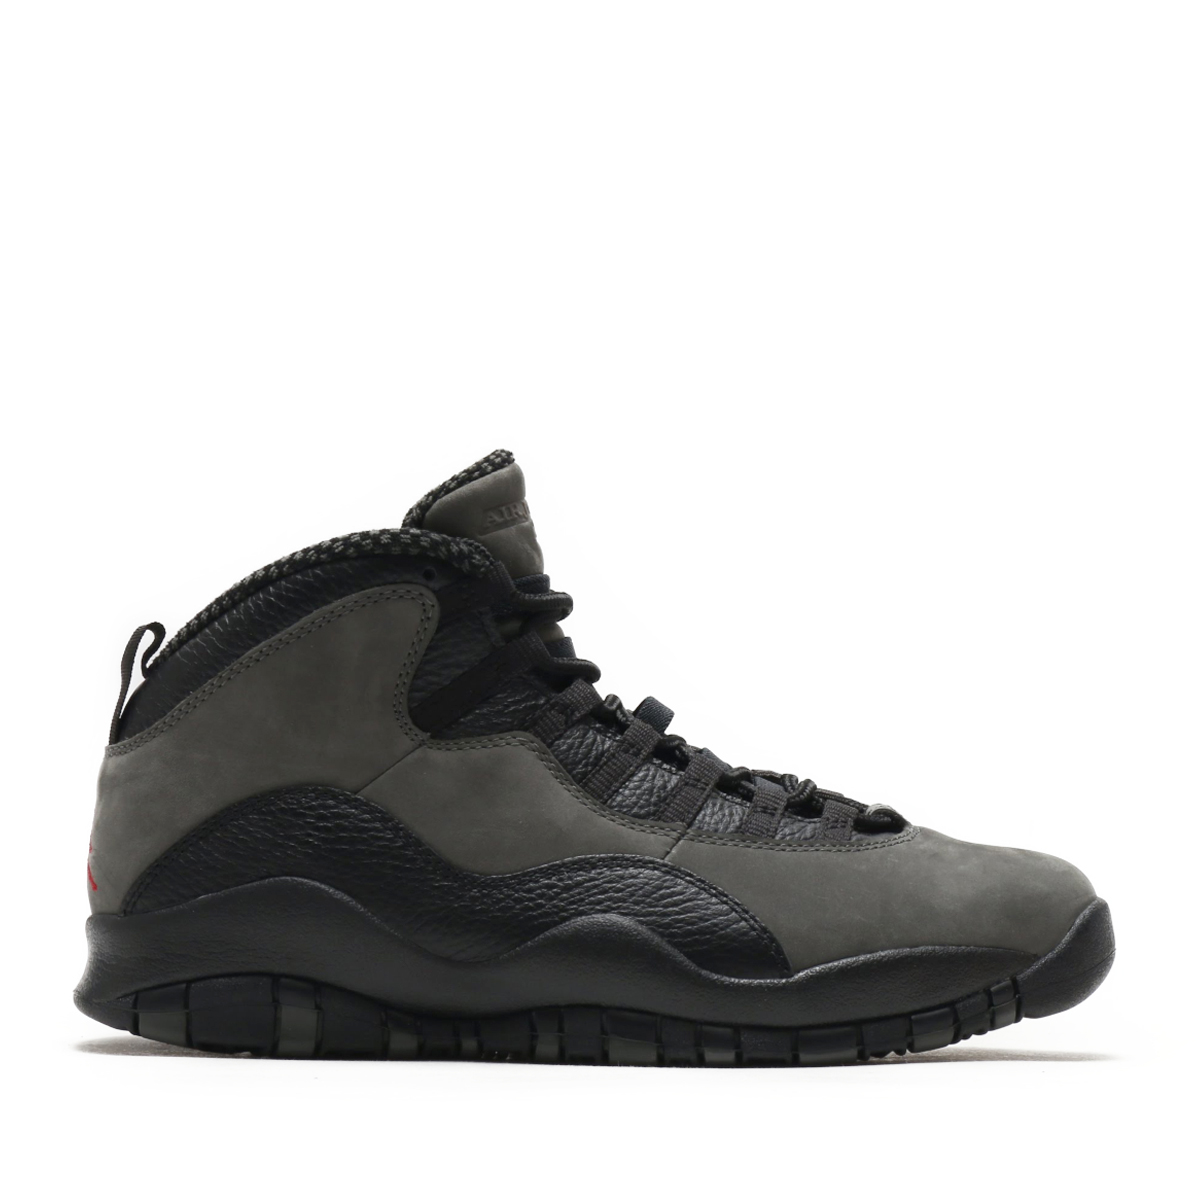 premium selection 8601c e8982 ... NIKE AIR JORDAN 10 RETRO (nostalgic Nike Air Jordan 10) (DARK SHADOW   ...